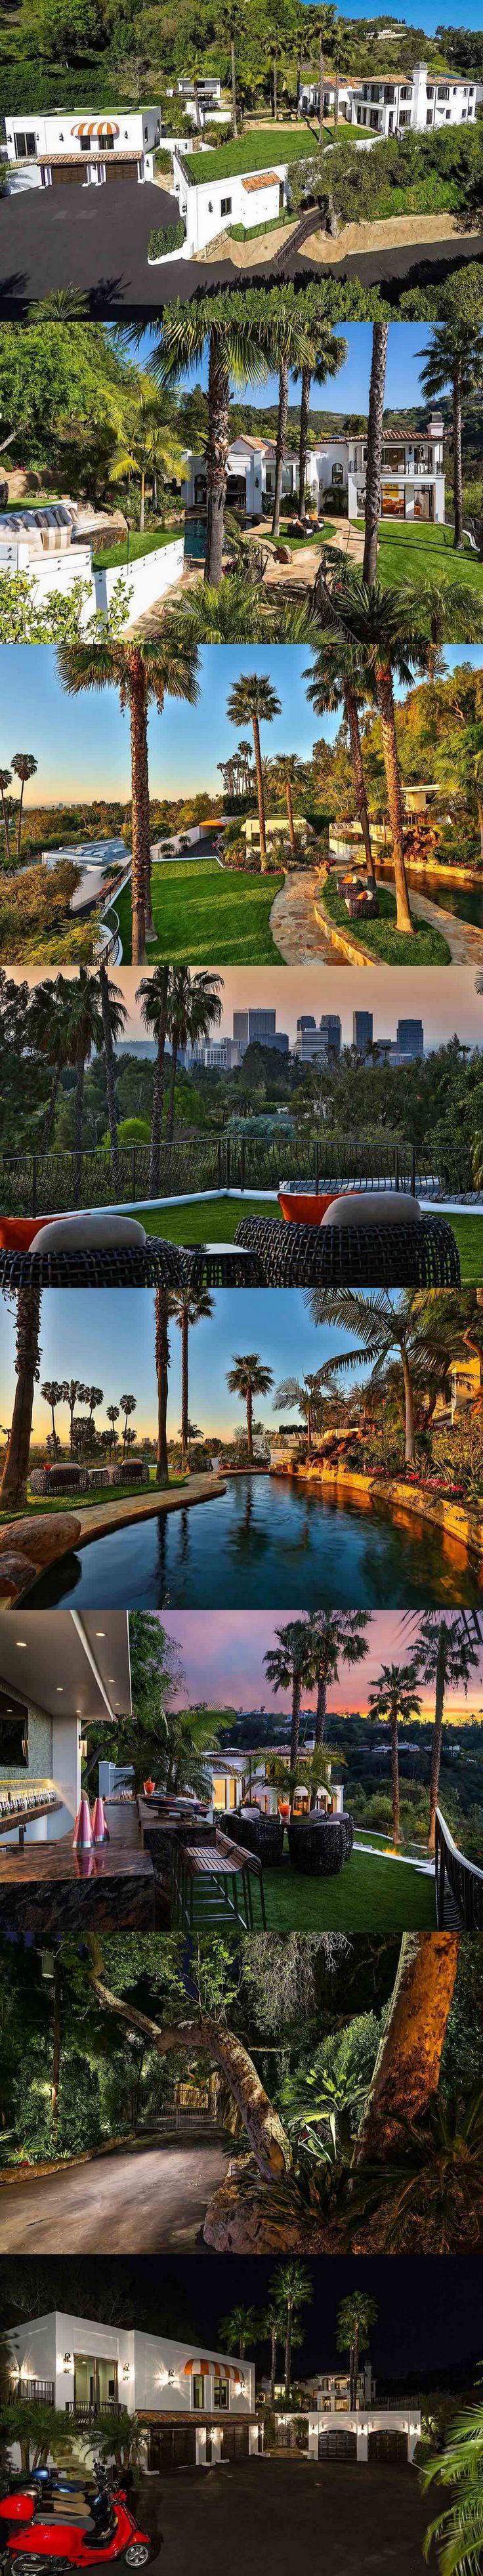 634 best mansions images on pinterest